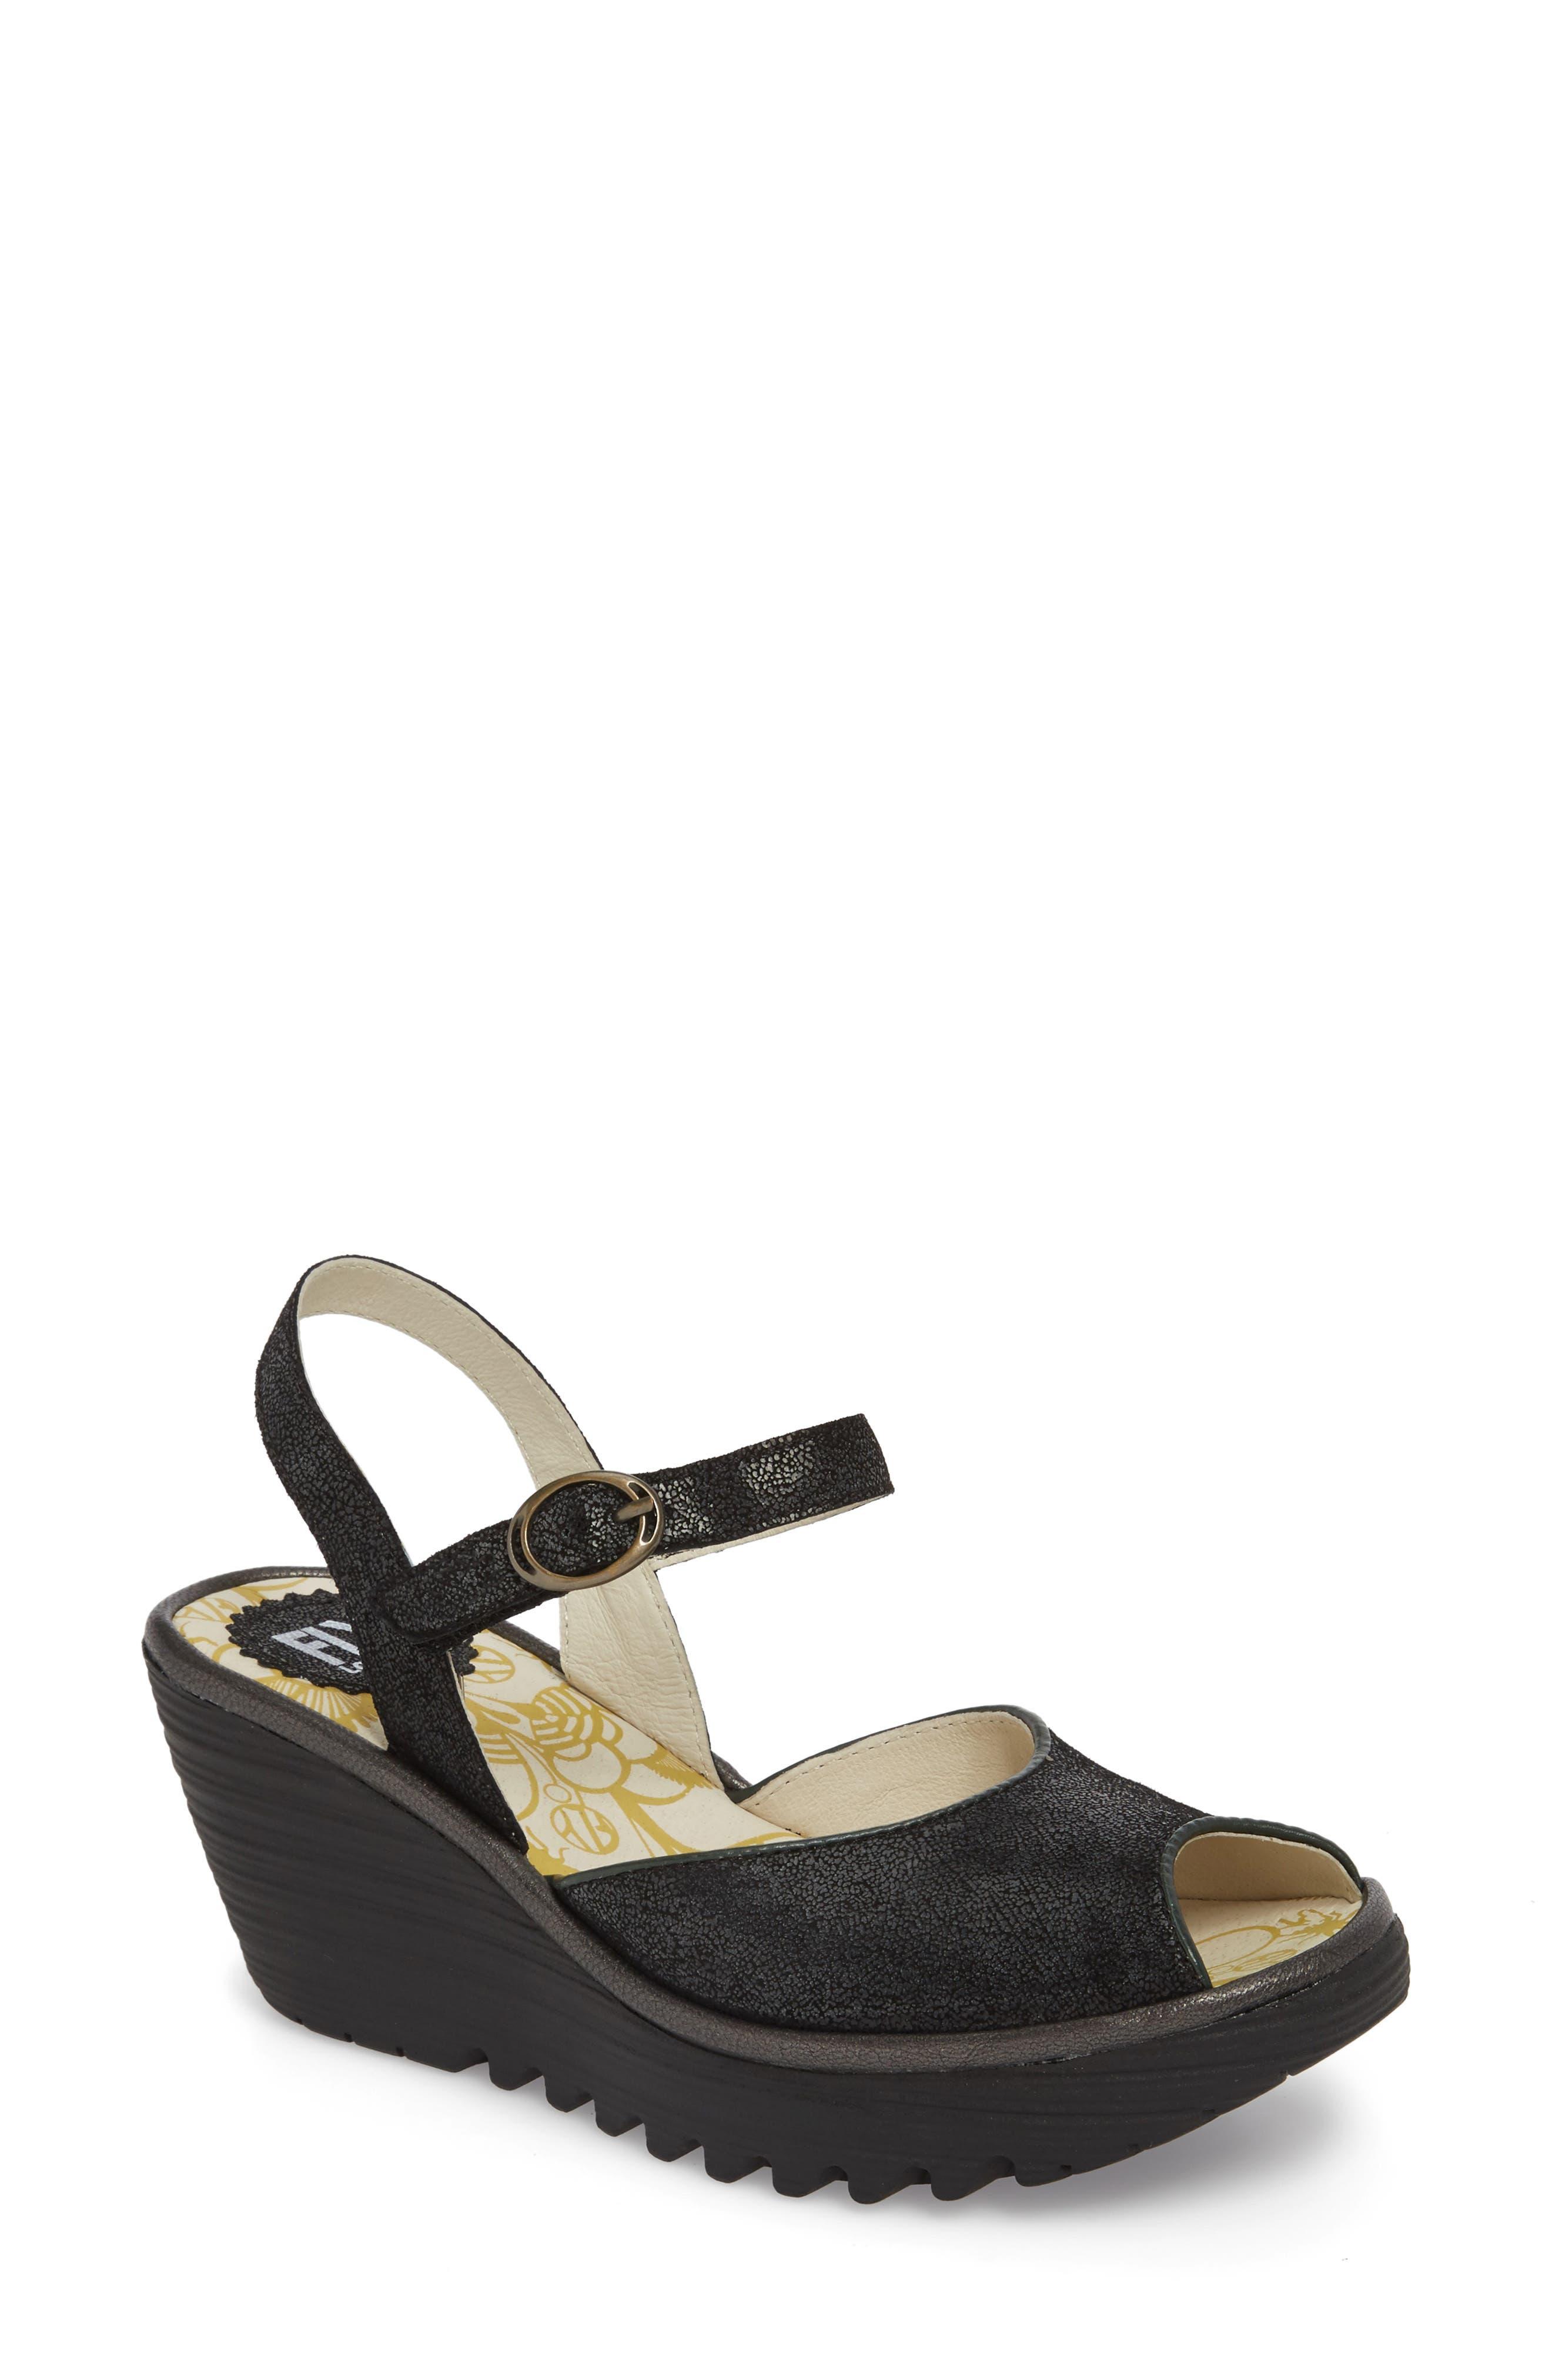 Yora Wedge Sandal,                             Main thumbnail 1, color,                             Black/ Graphite Leather